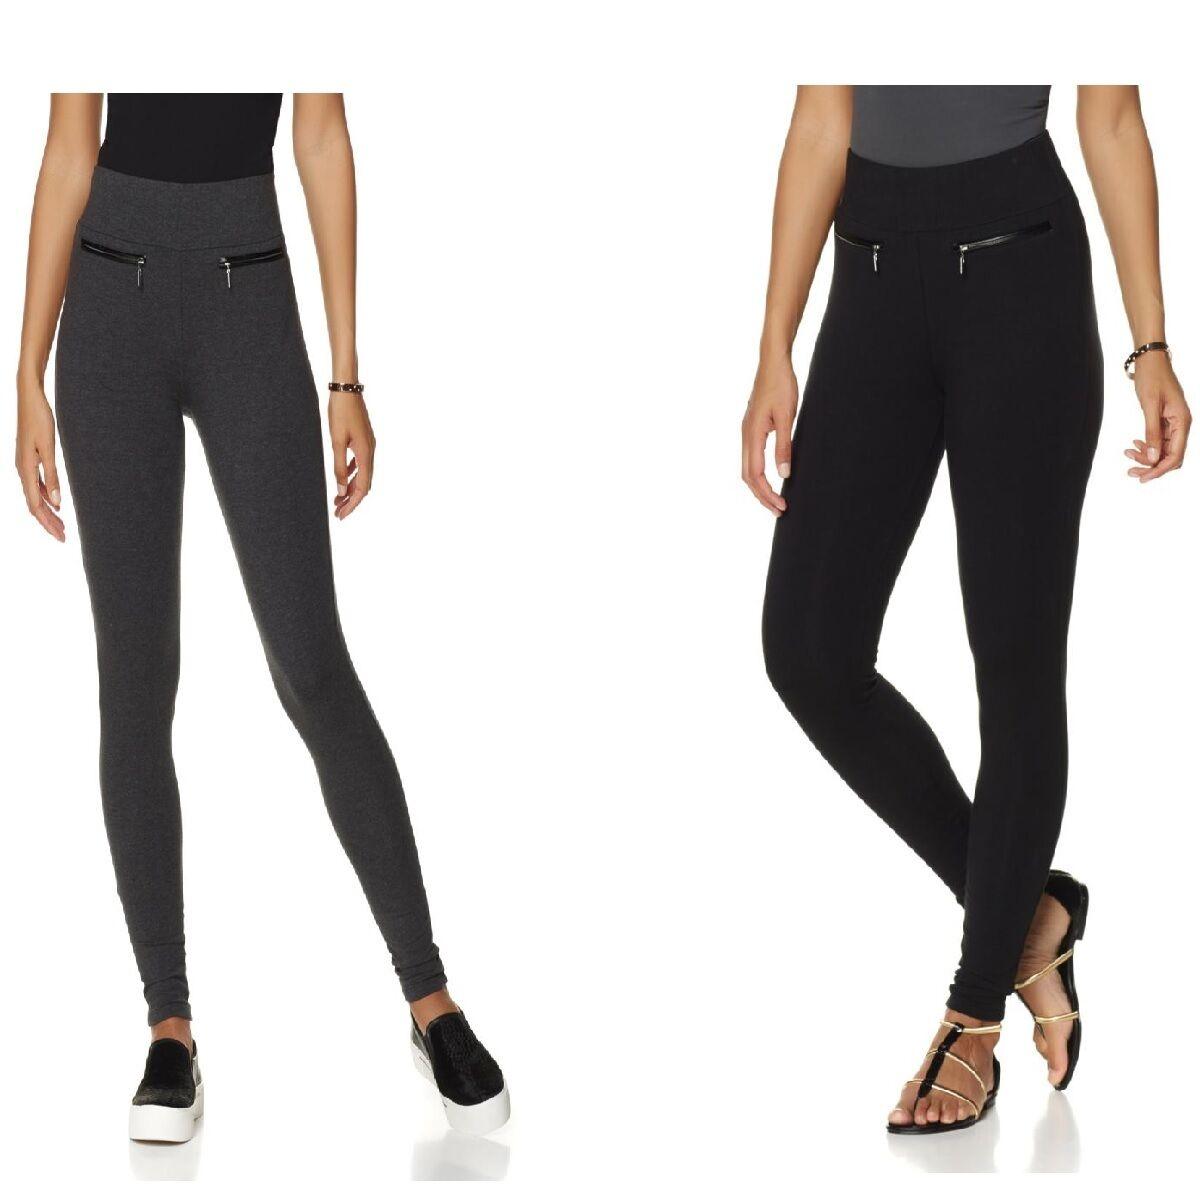 69 Samantha Brown Legging with Zipper 488584J (1X, Heather Charcoal)  39.90